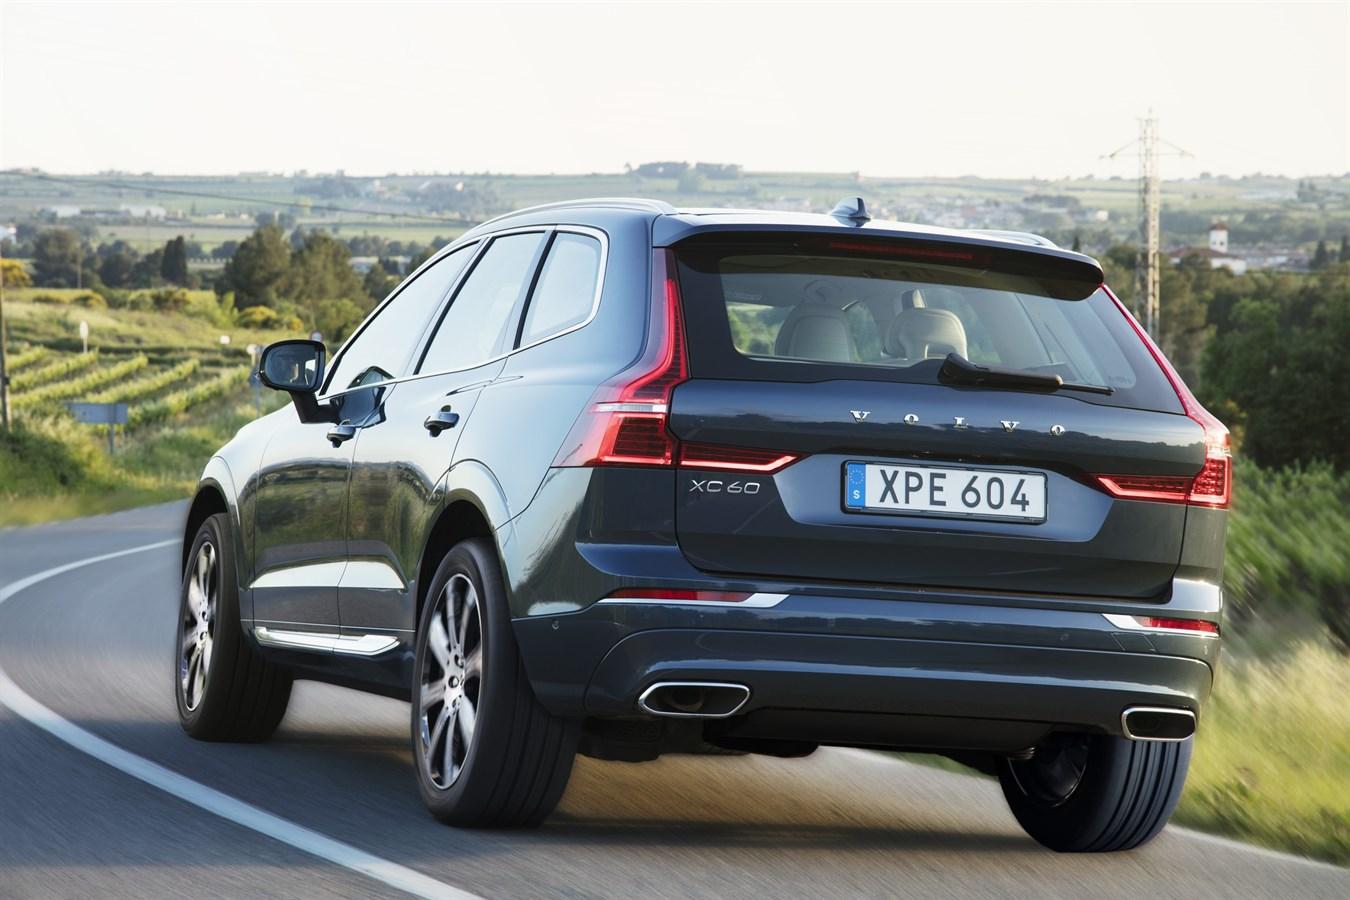 The New Volvo Xc60 T6 Volvo Cars Global Media Newsroom